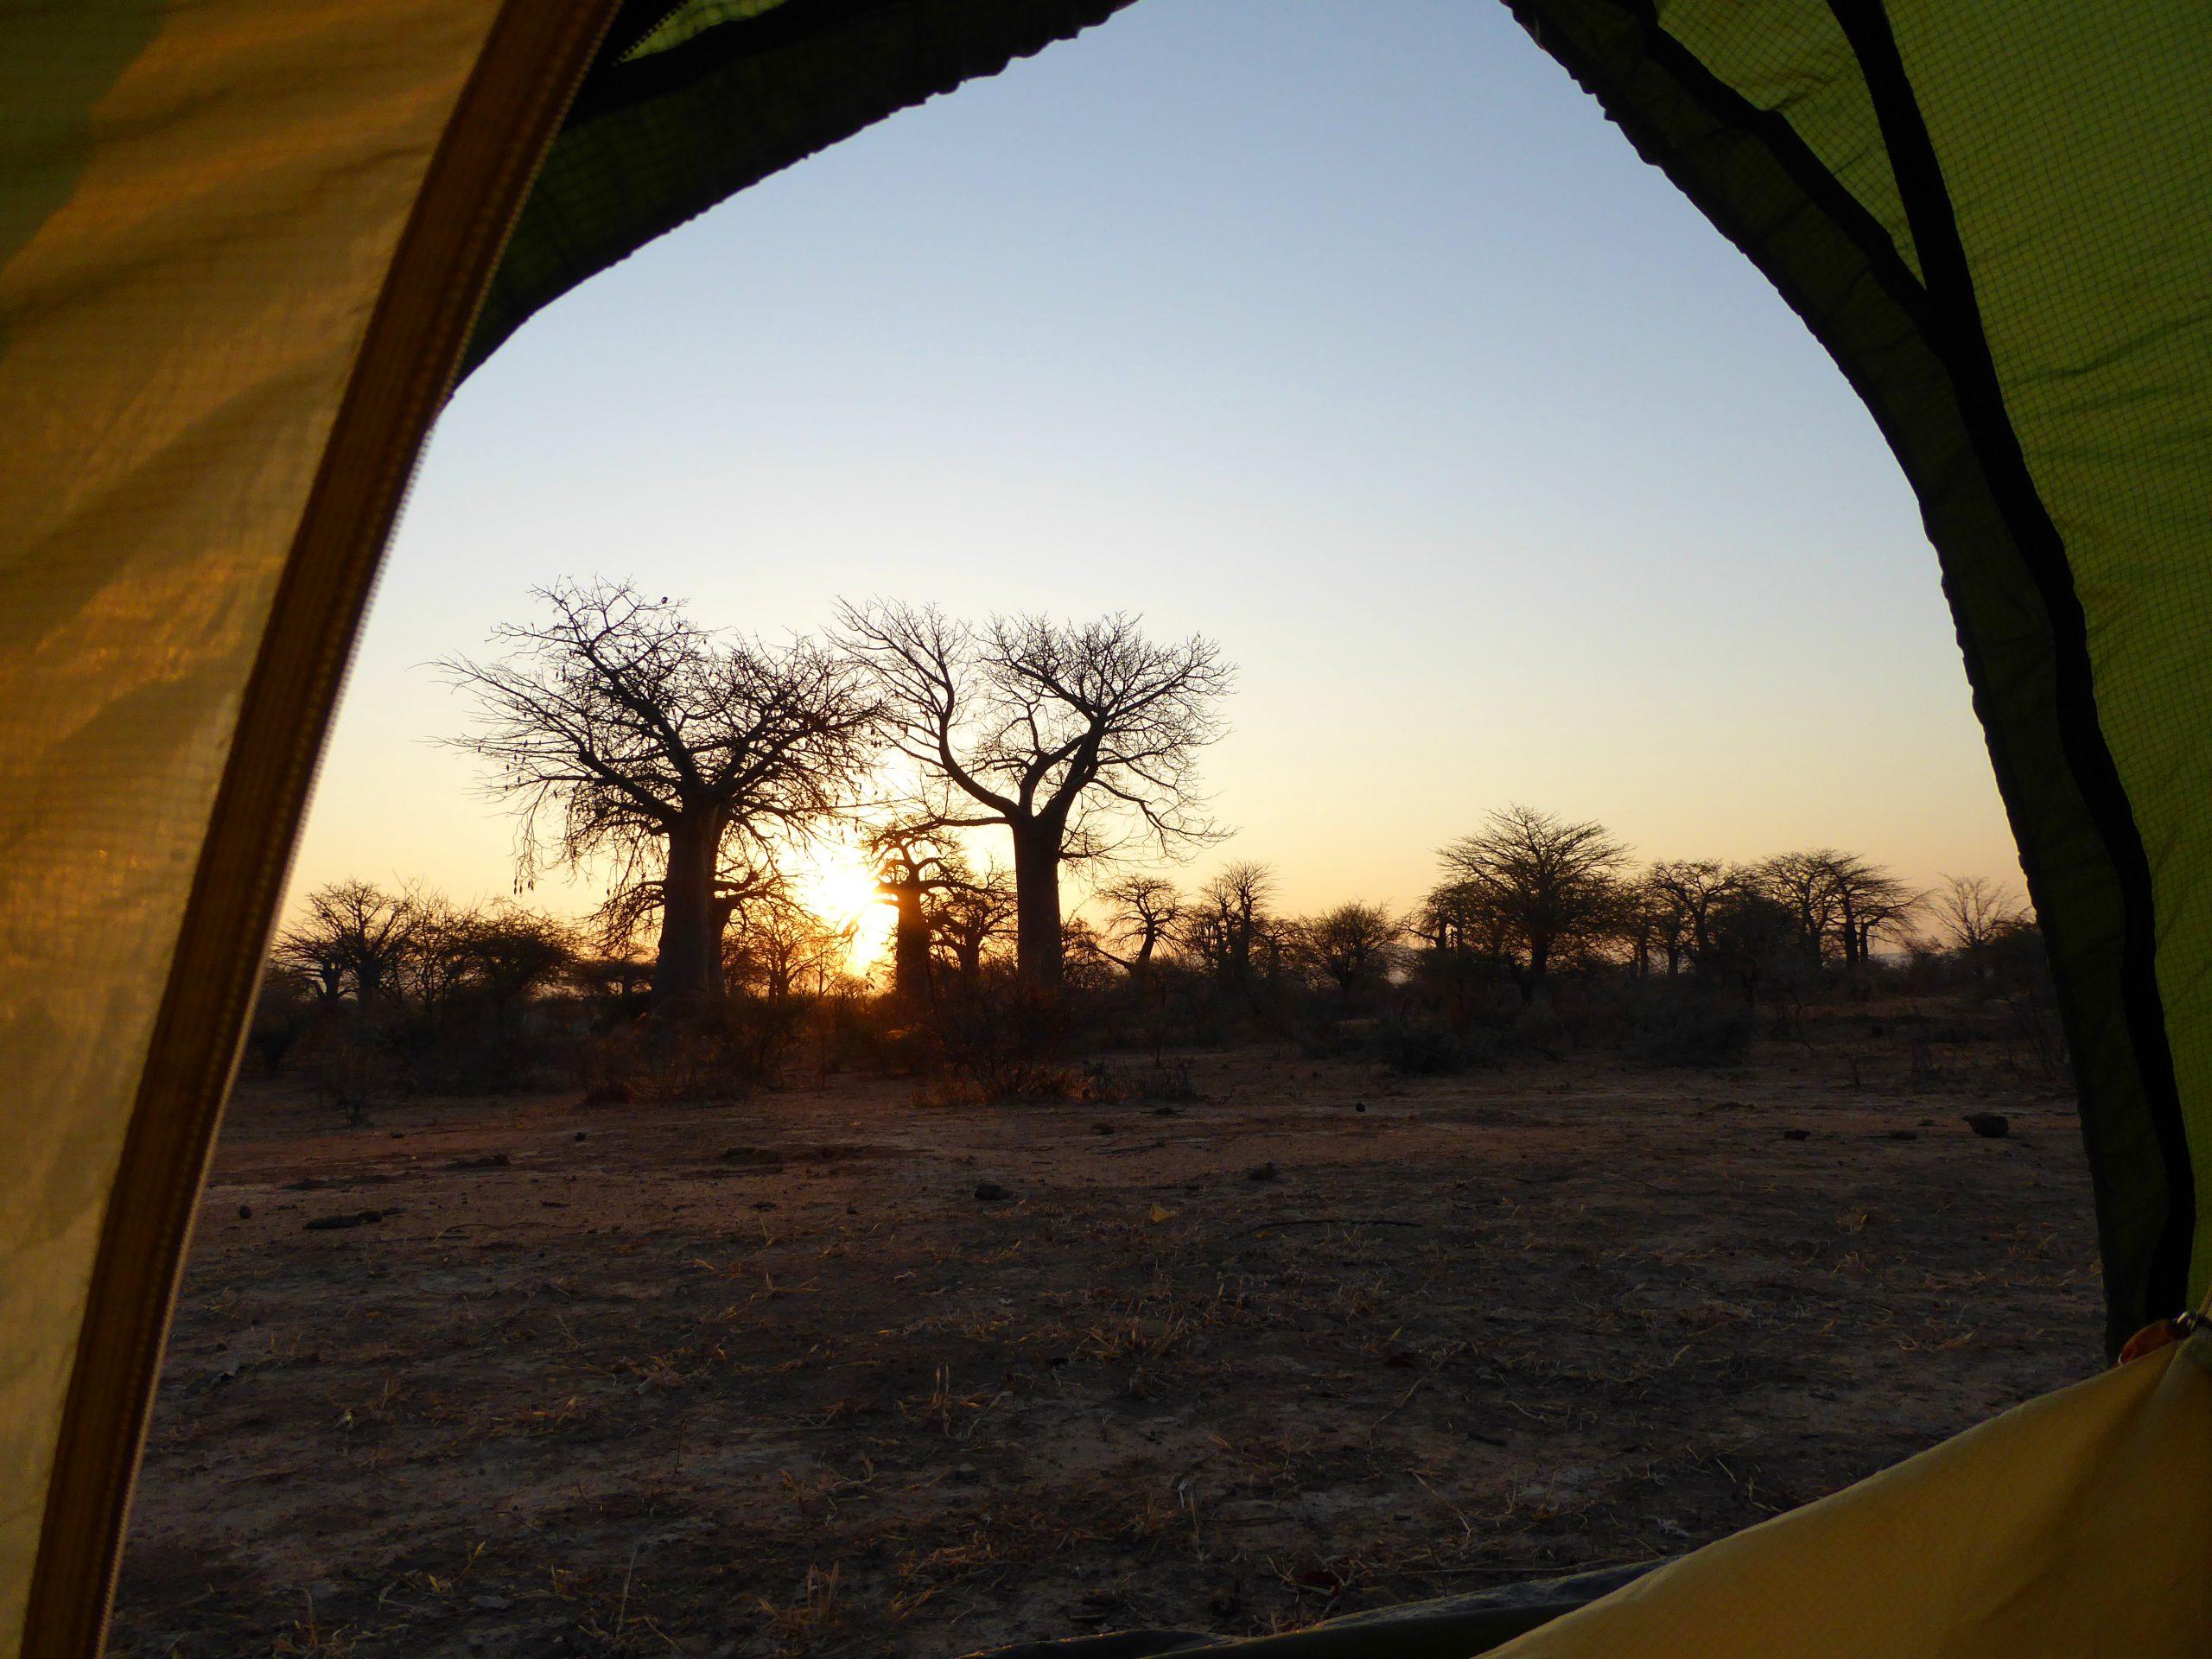 Radreise Afrika 2014 - Affenbrotbaum (Baobab) im Sonnenaufgang